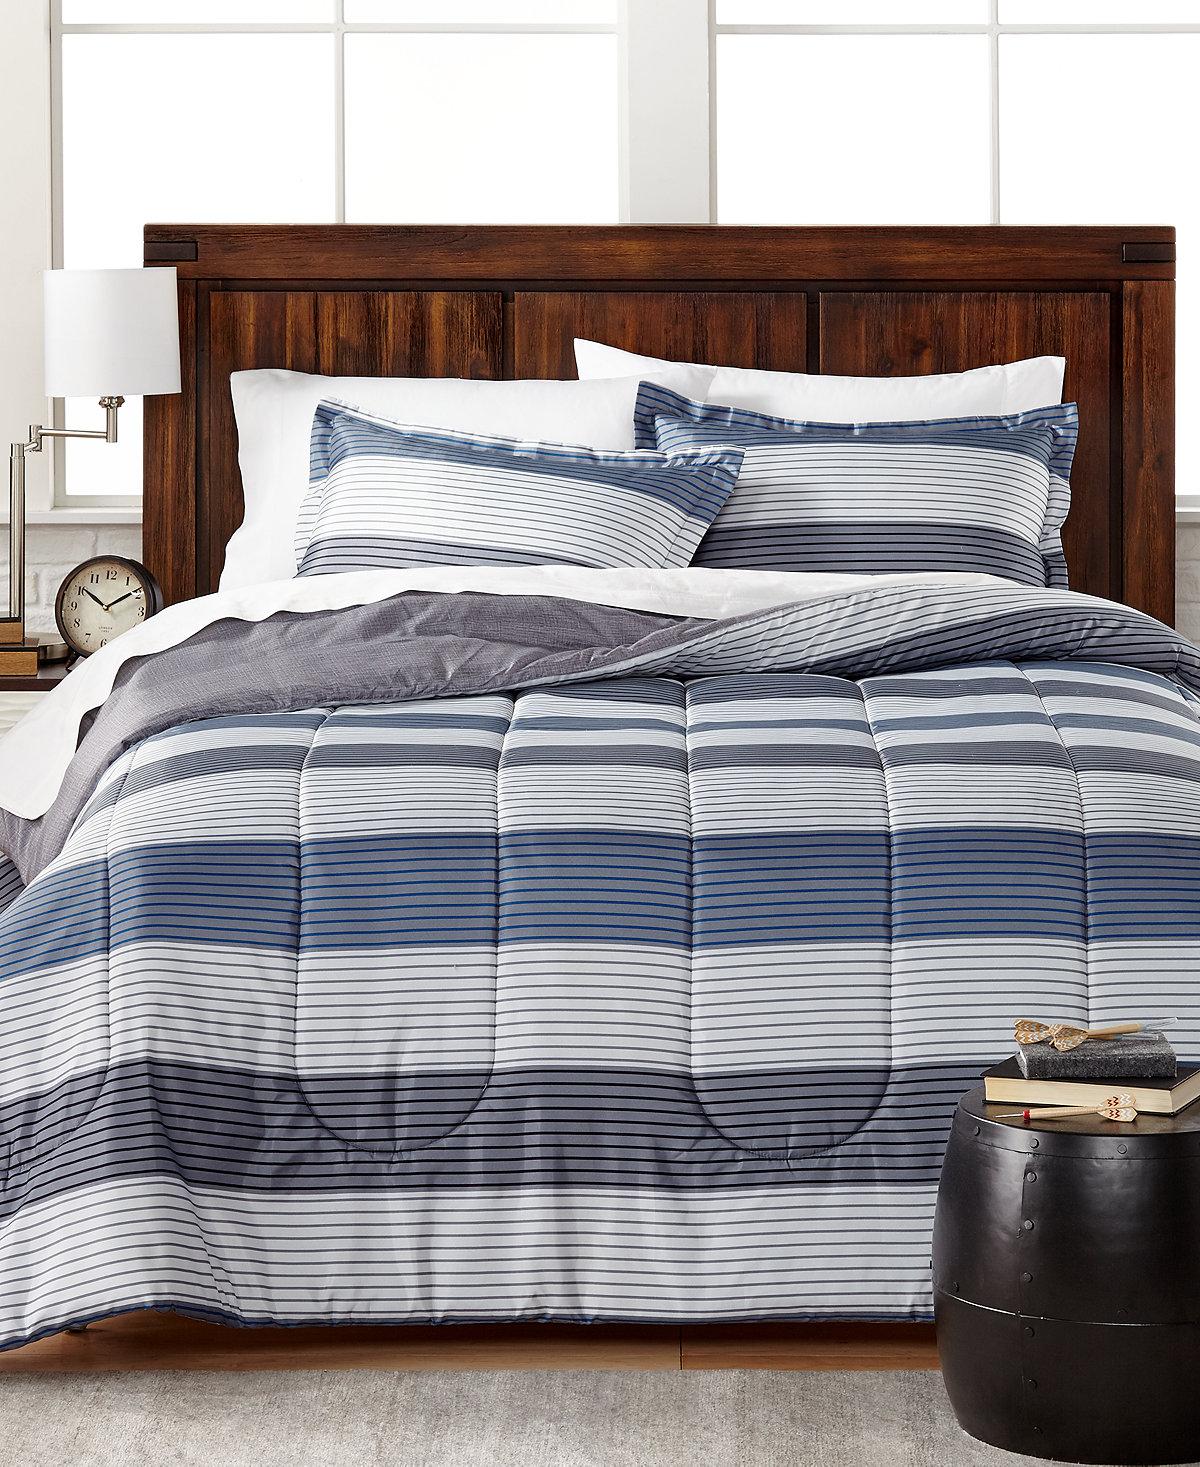 Bennet 3-Pc. Comforter Set